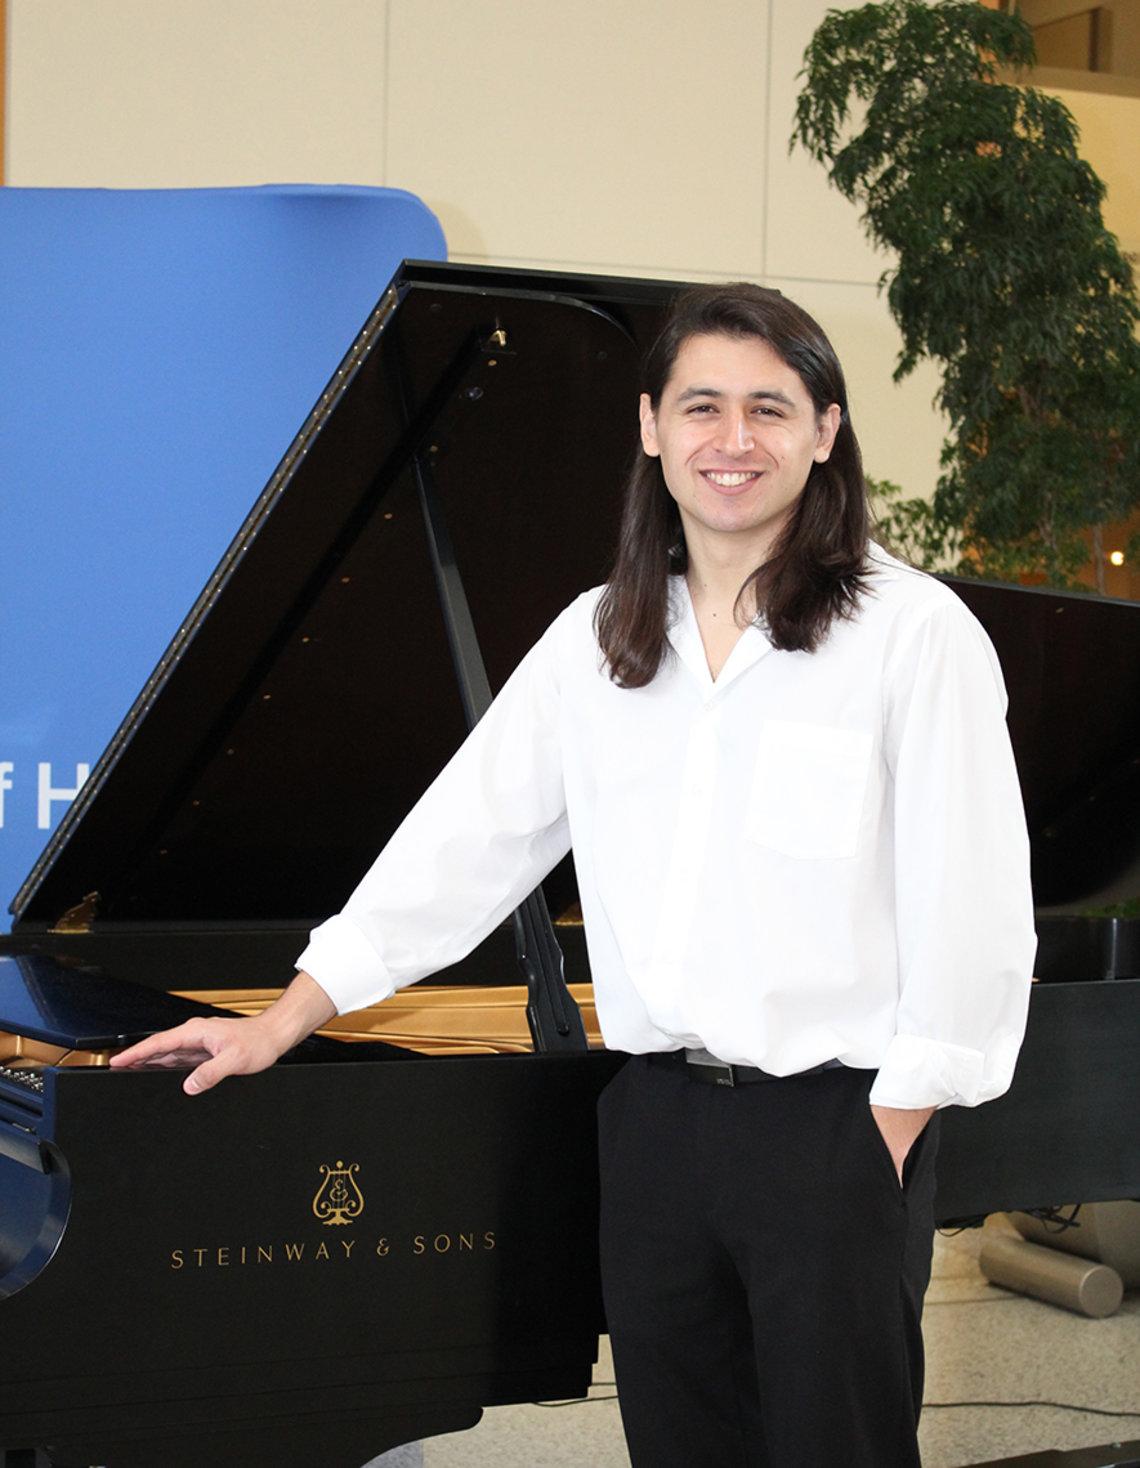 Local pianist, composer and singer Chris Urquiaga.